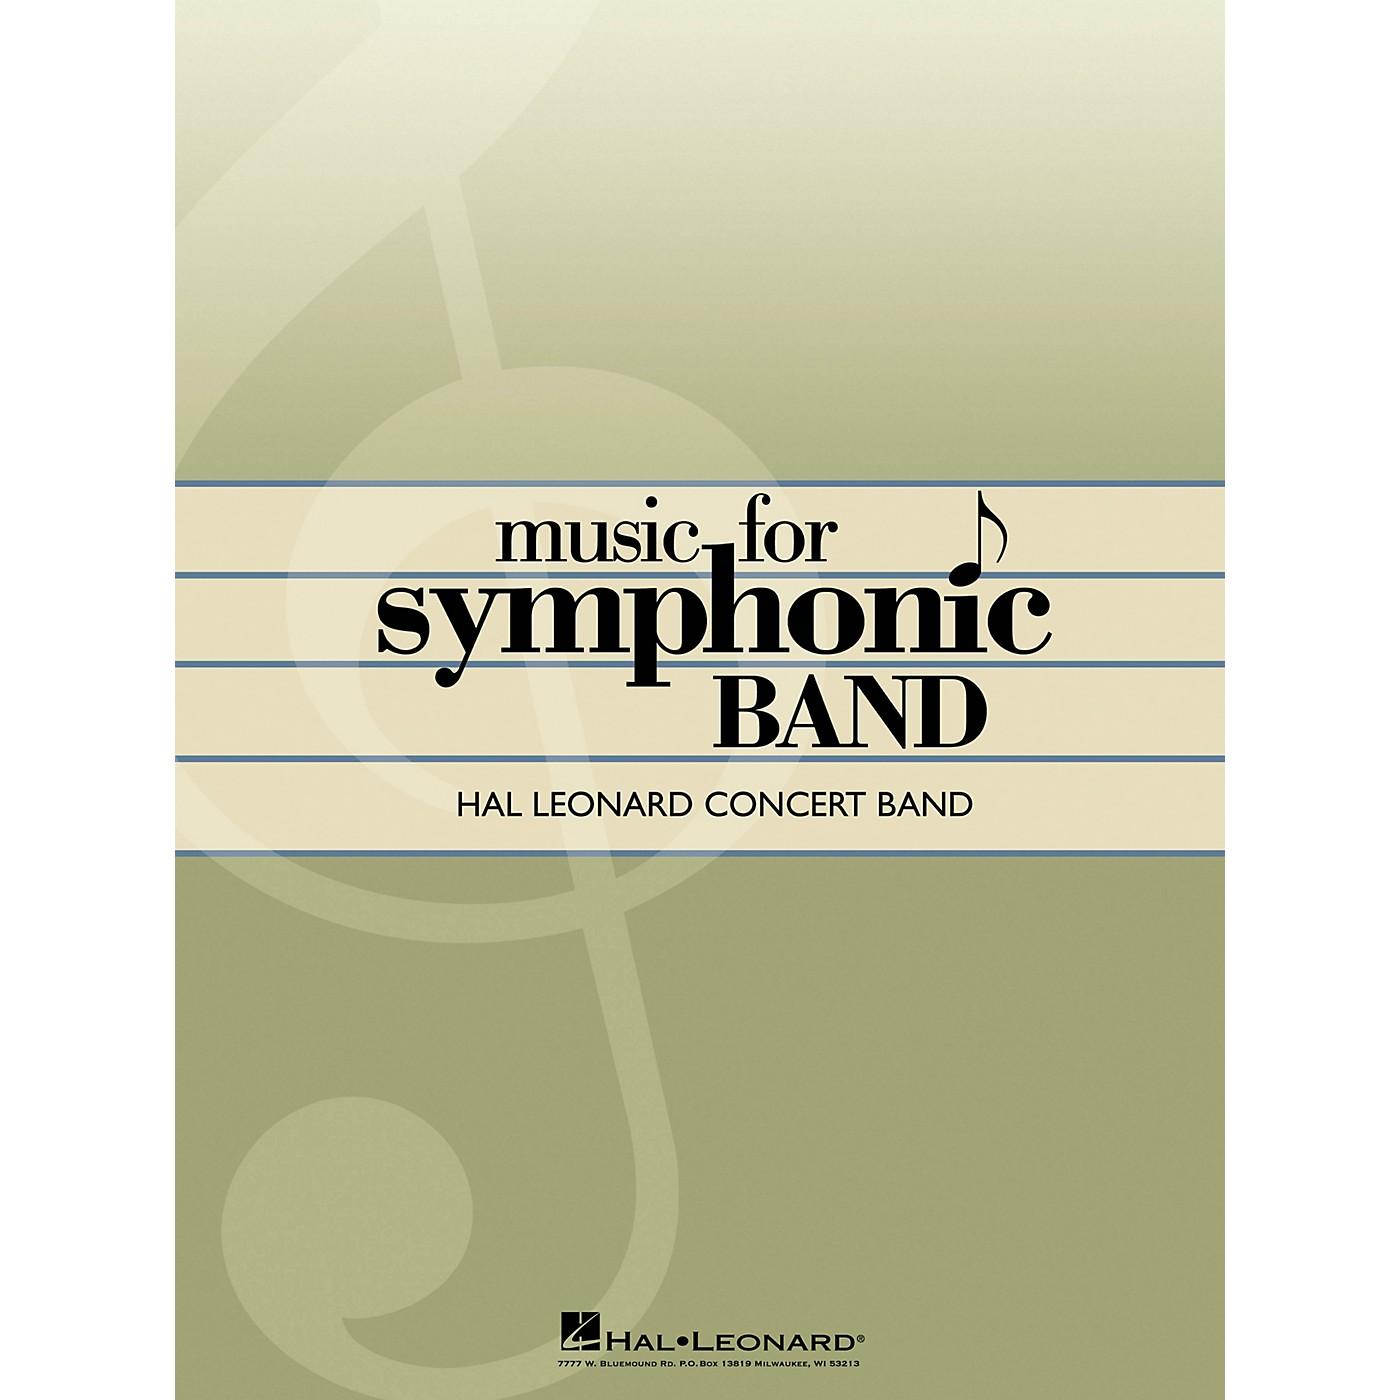 Hal Leonard A Salute to Spike Jones Concert Band Level 3 Arranged by Calvin Custer thumbnail